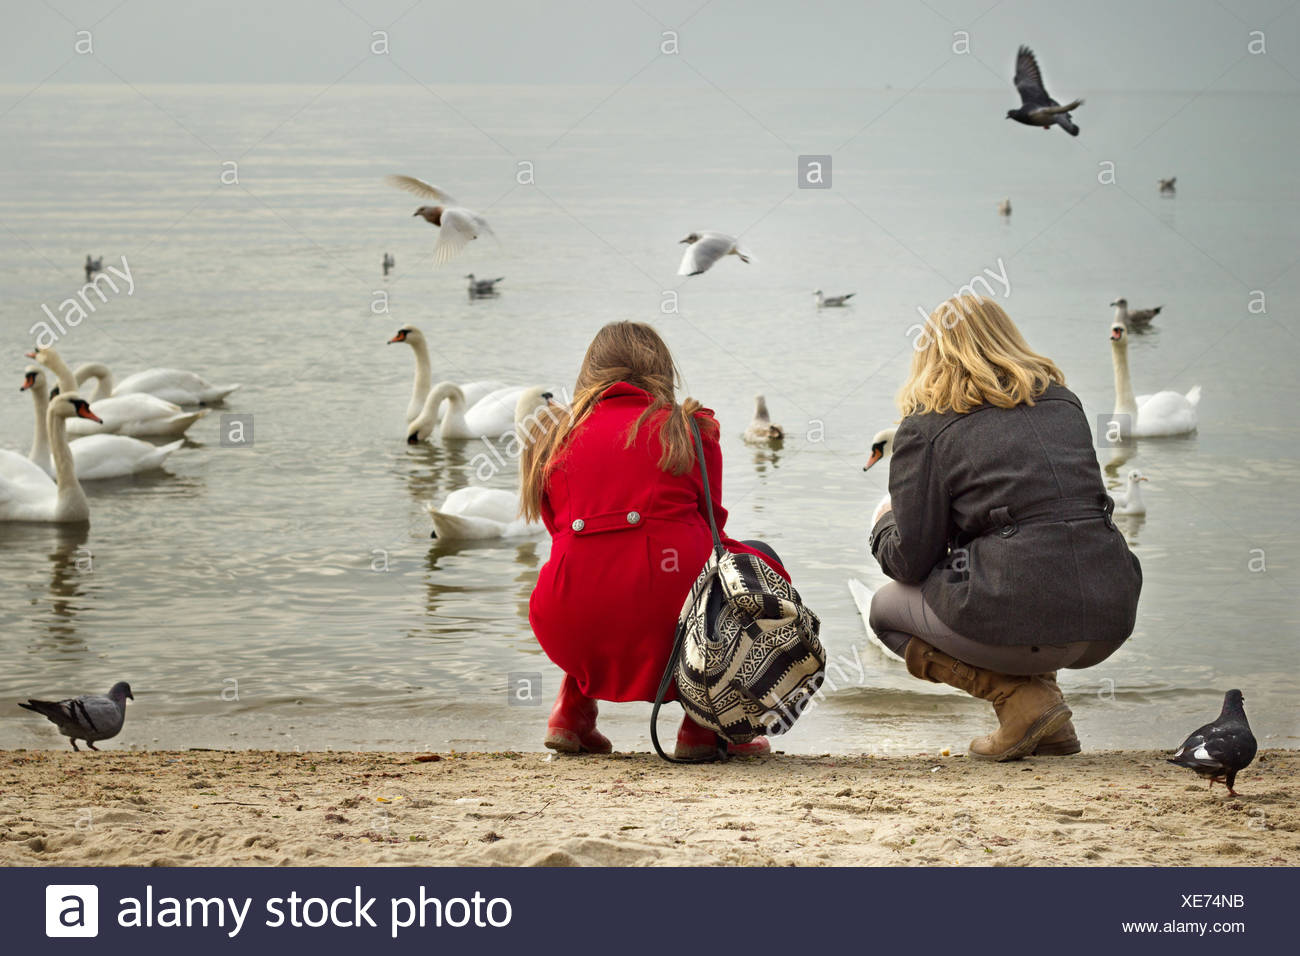 Bulgaria, Varna, Two girls (12-13, 16-17) on beach looking at birds - Stock Image